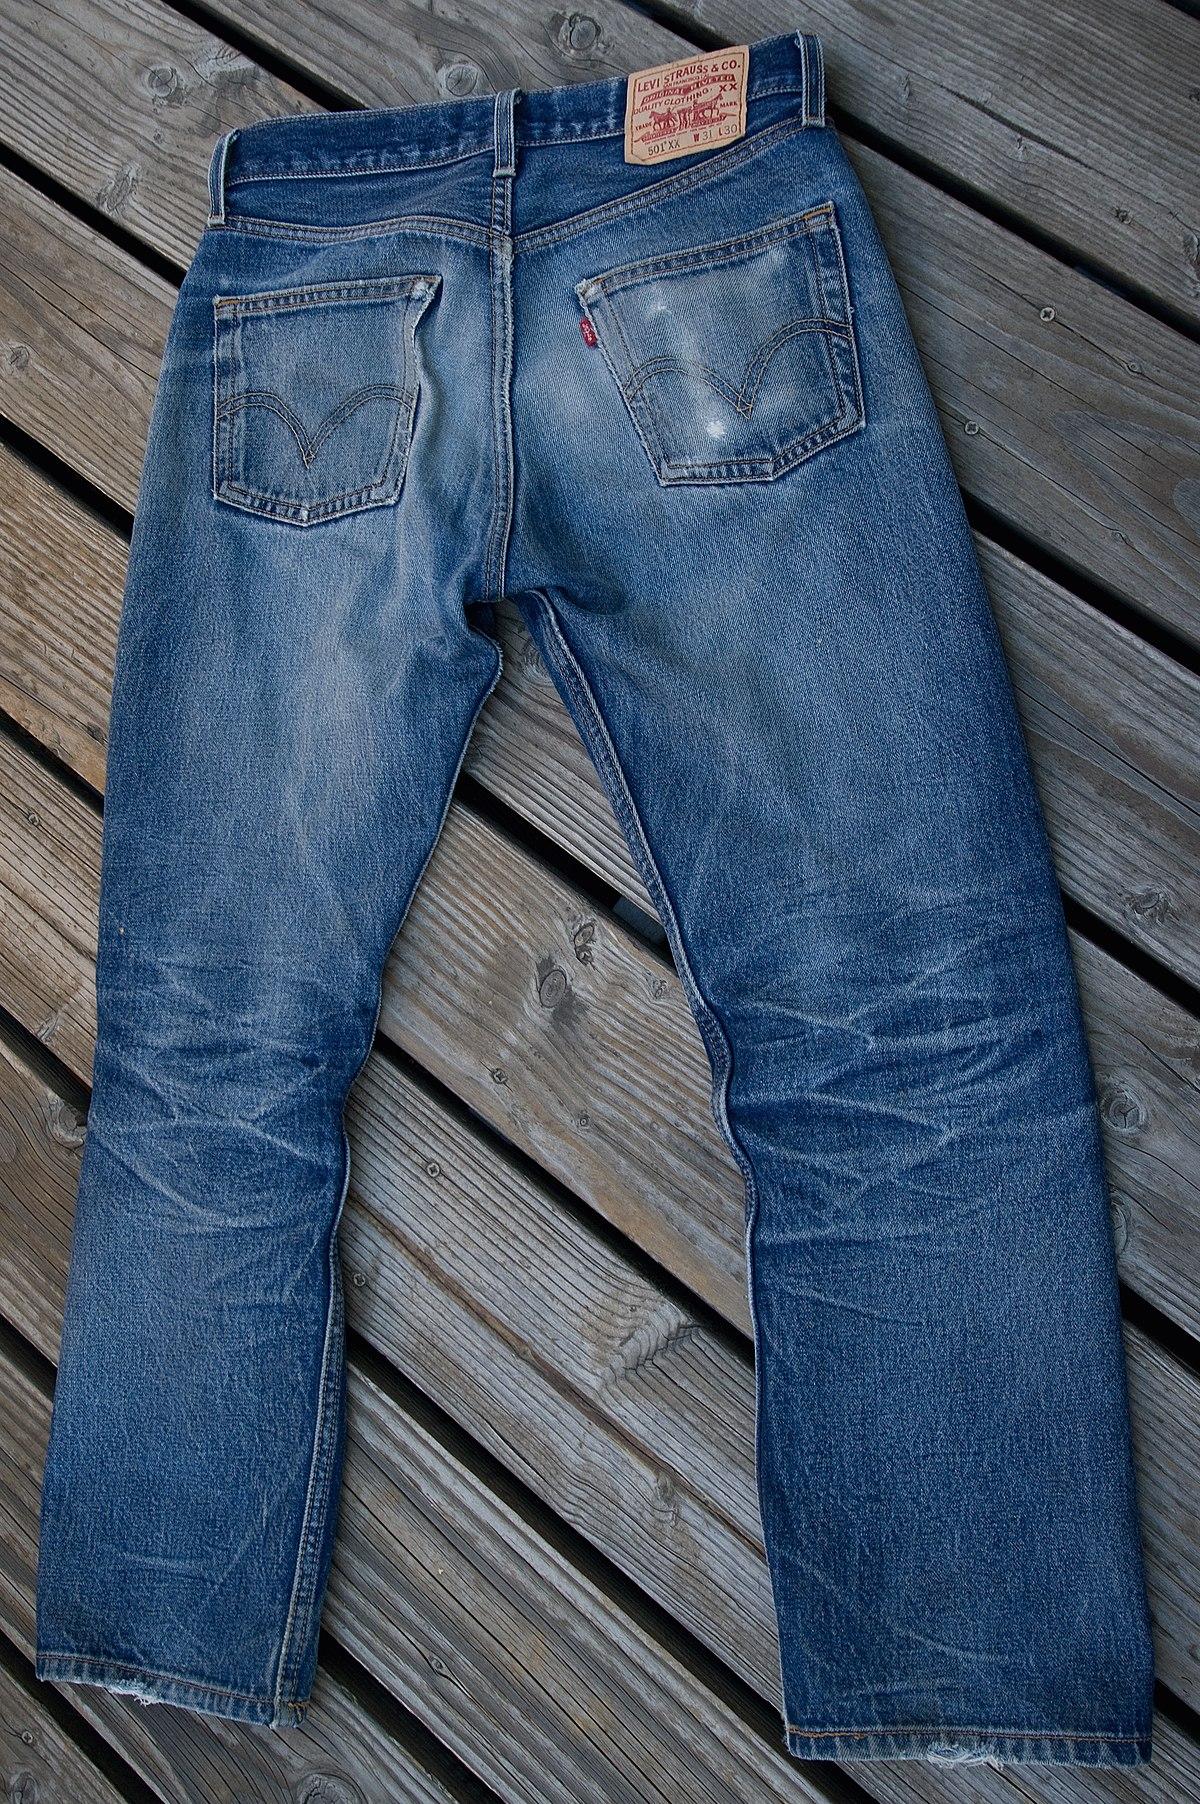 chemise en jean denim homme